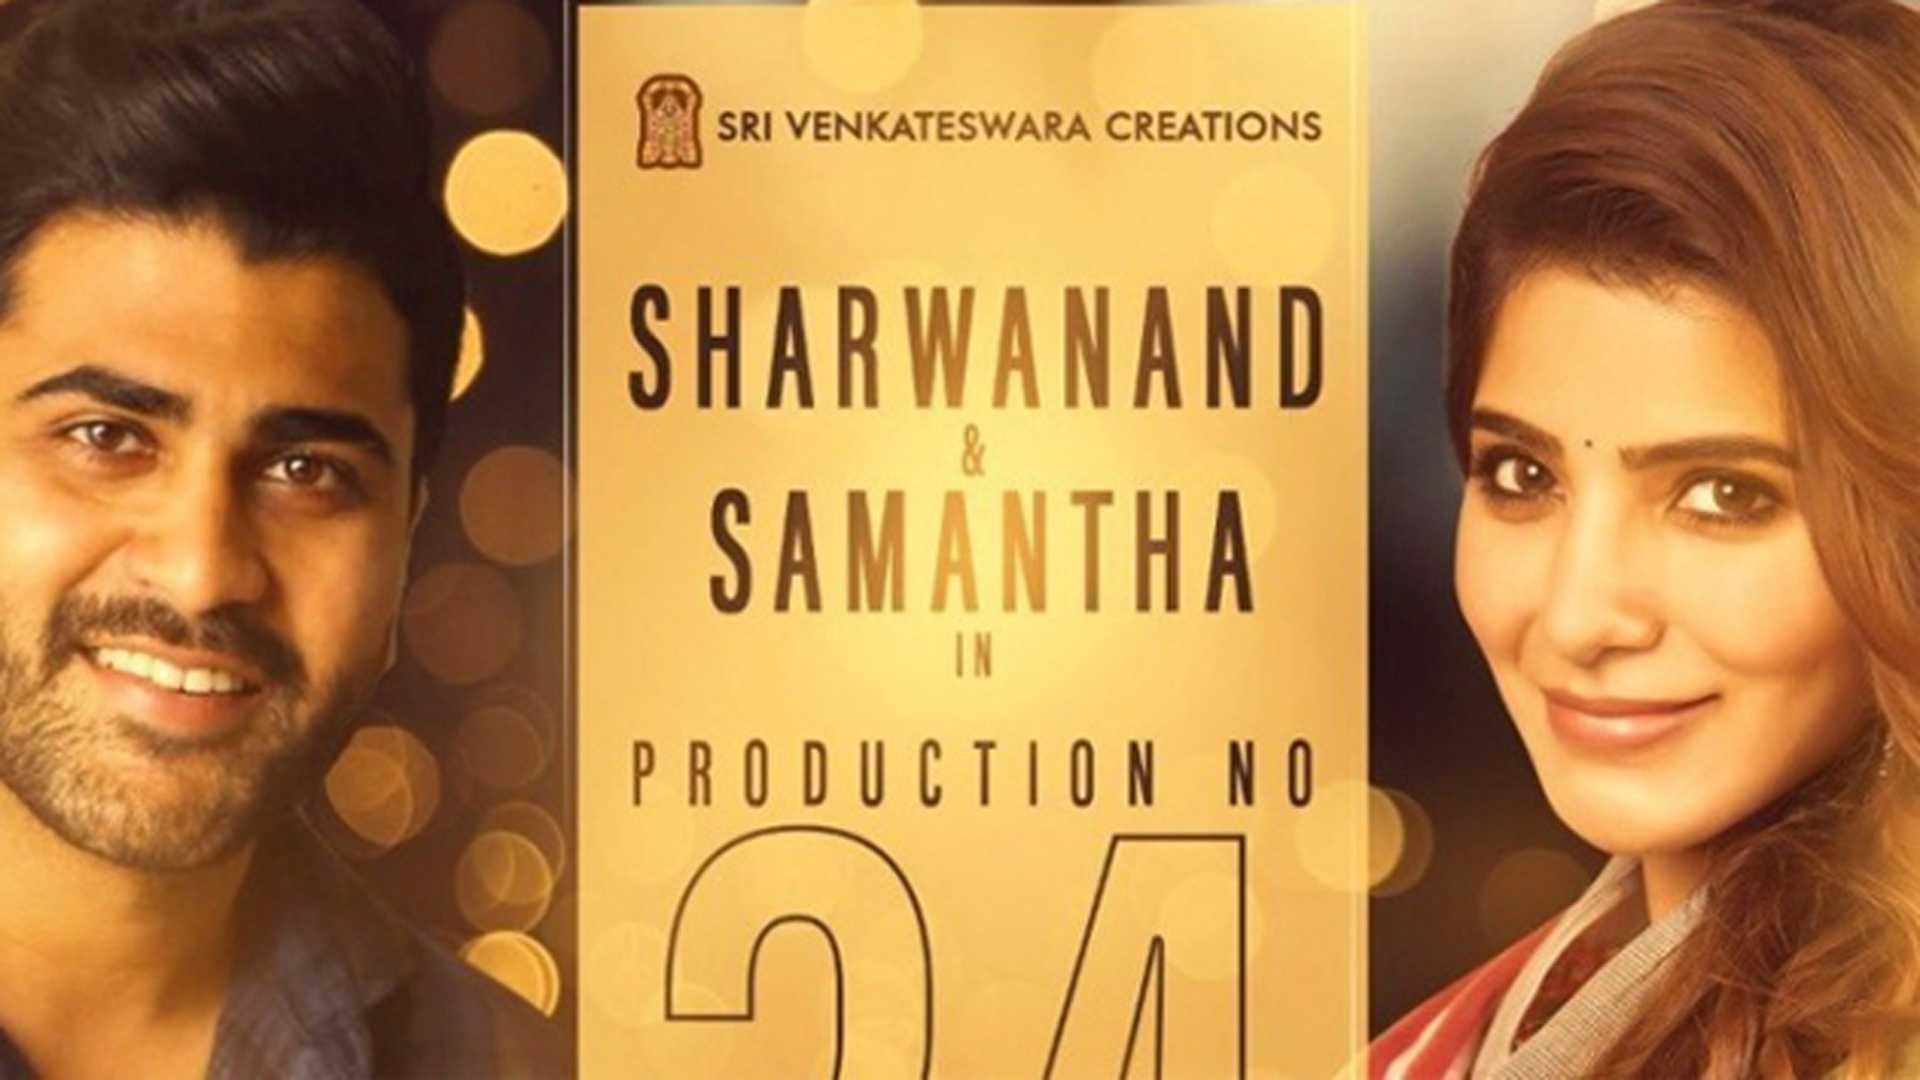 Sharwanand Samantha 96 Telugu remake